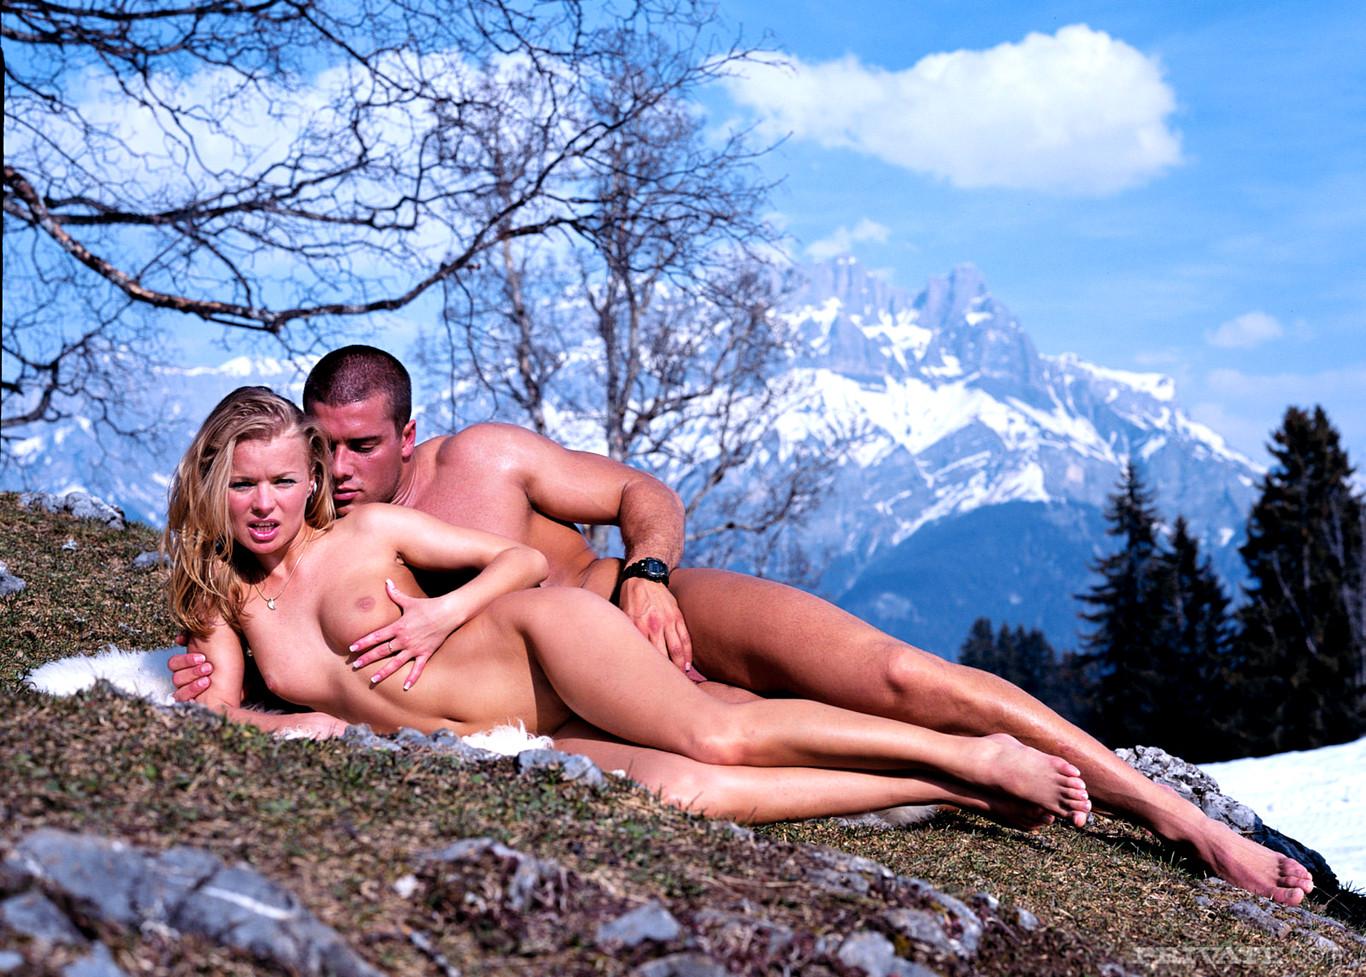 порно в горах порнофото время секса